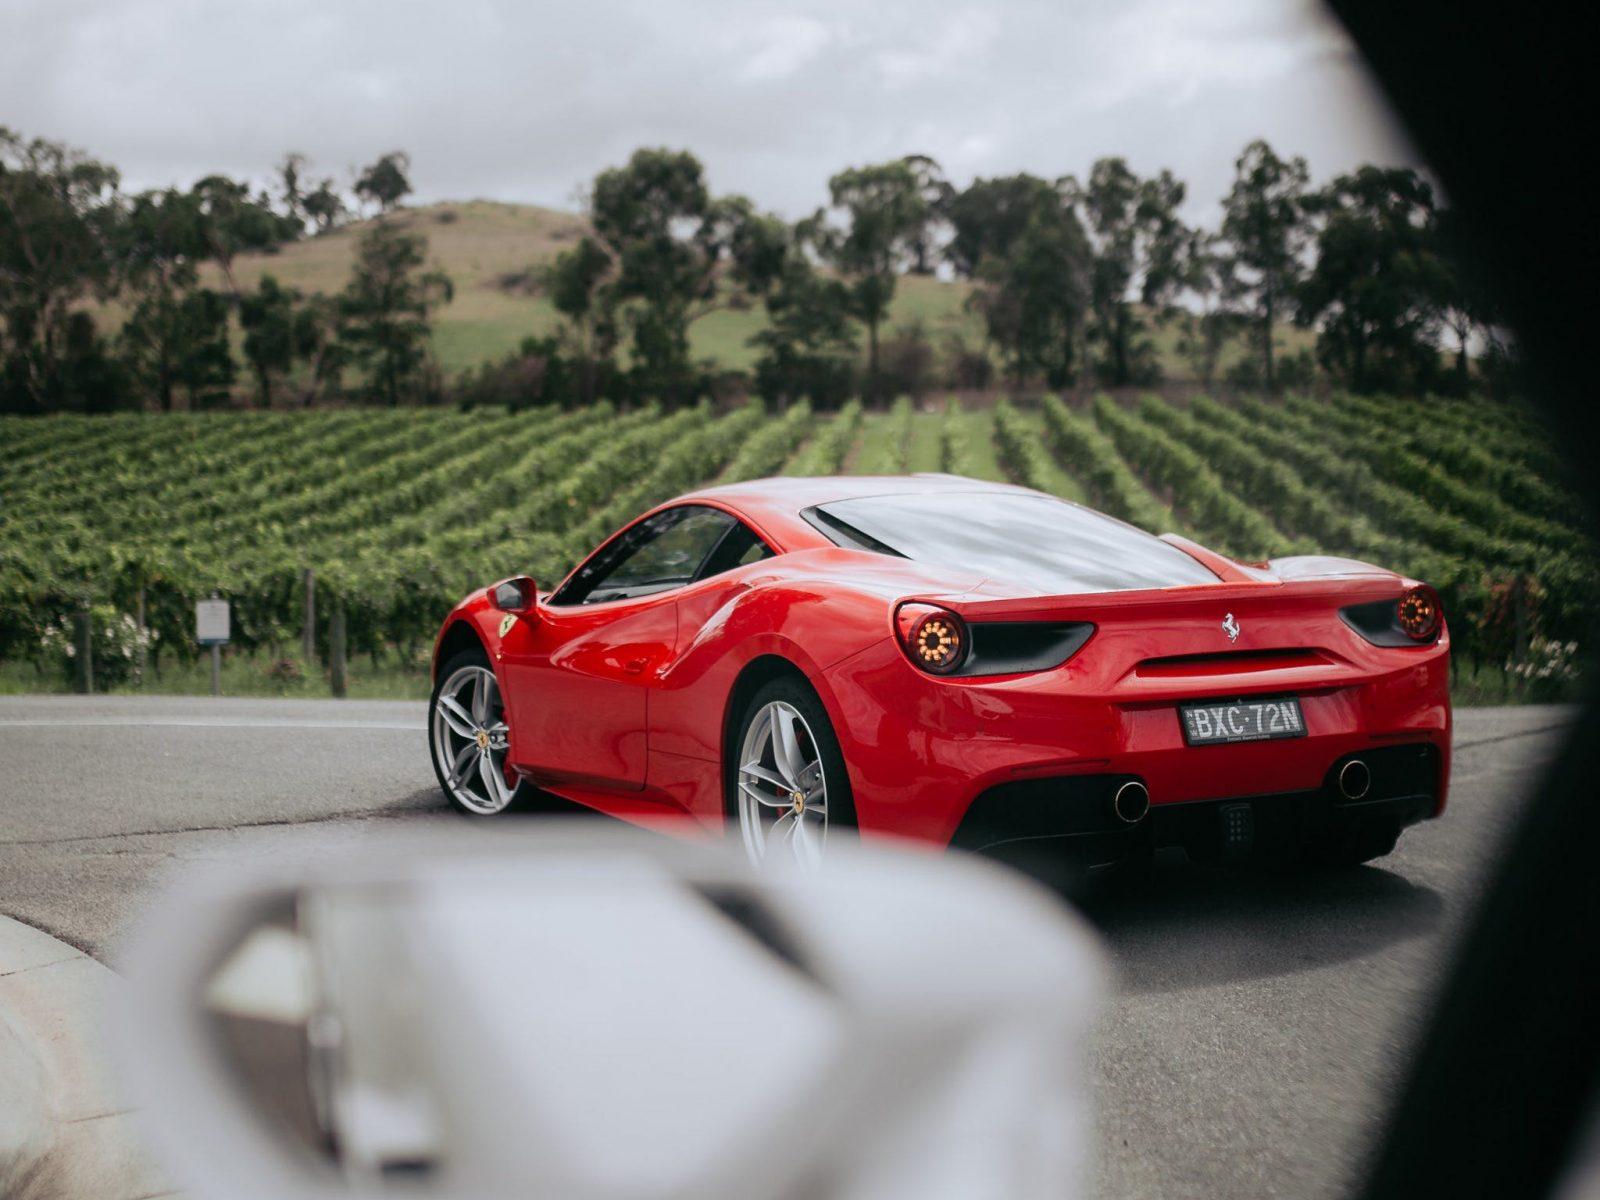 Drive a brand new Ferrari 488 GTB in the beautiful Yarra Valley - Melbourne Victoria